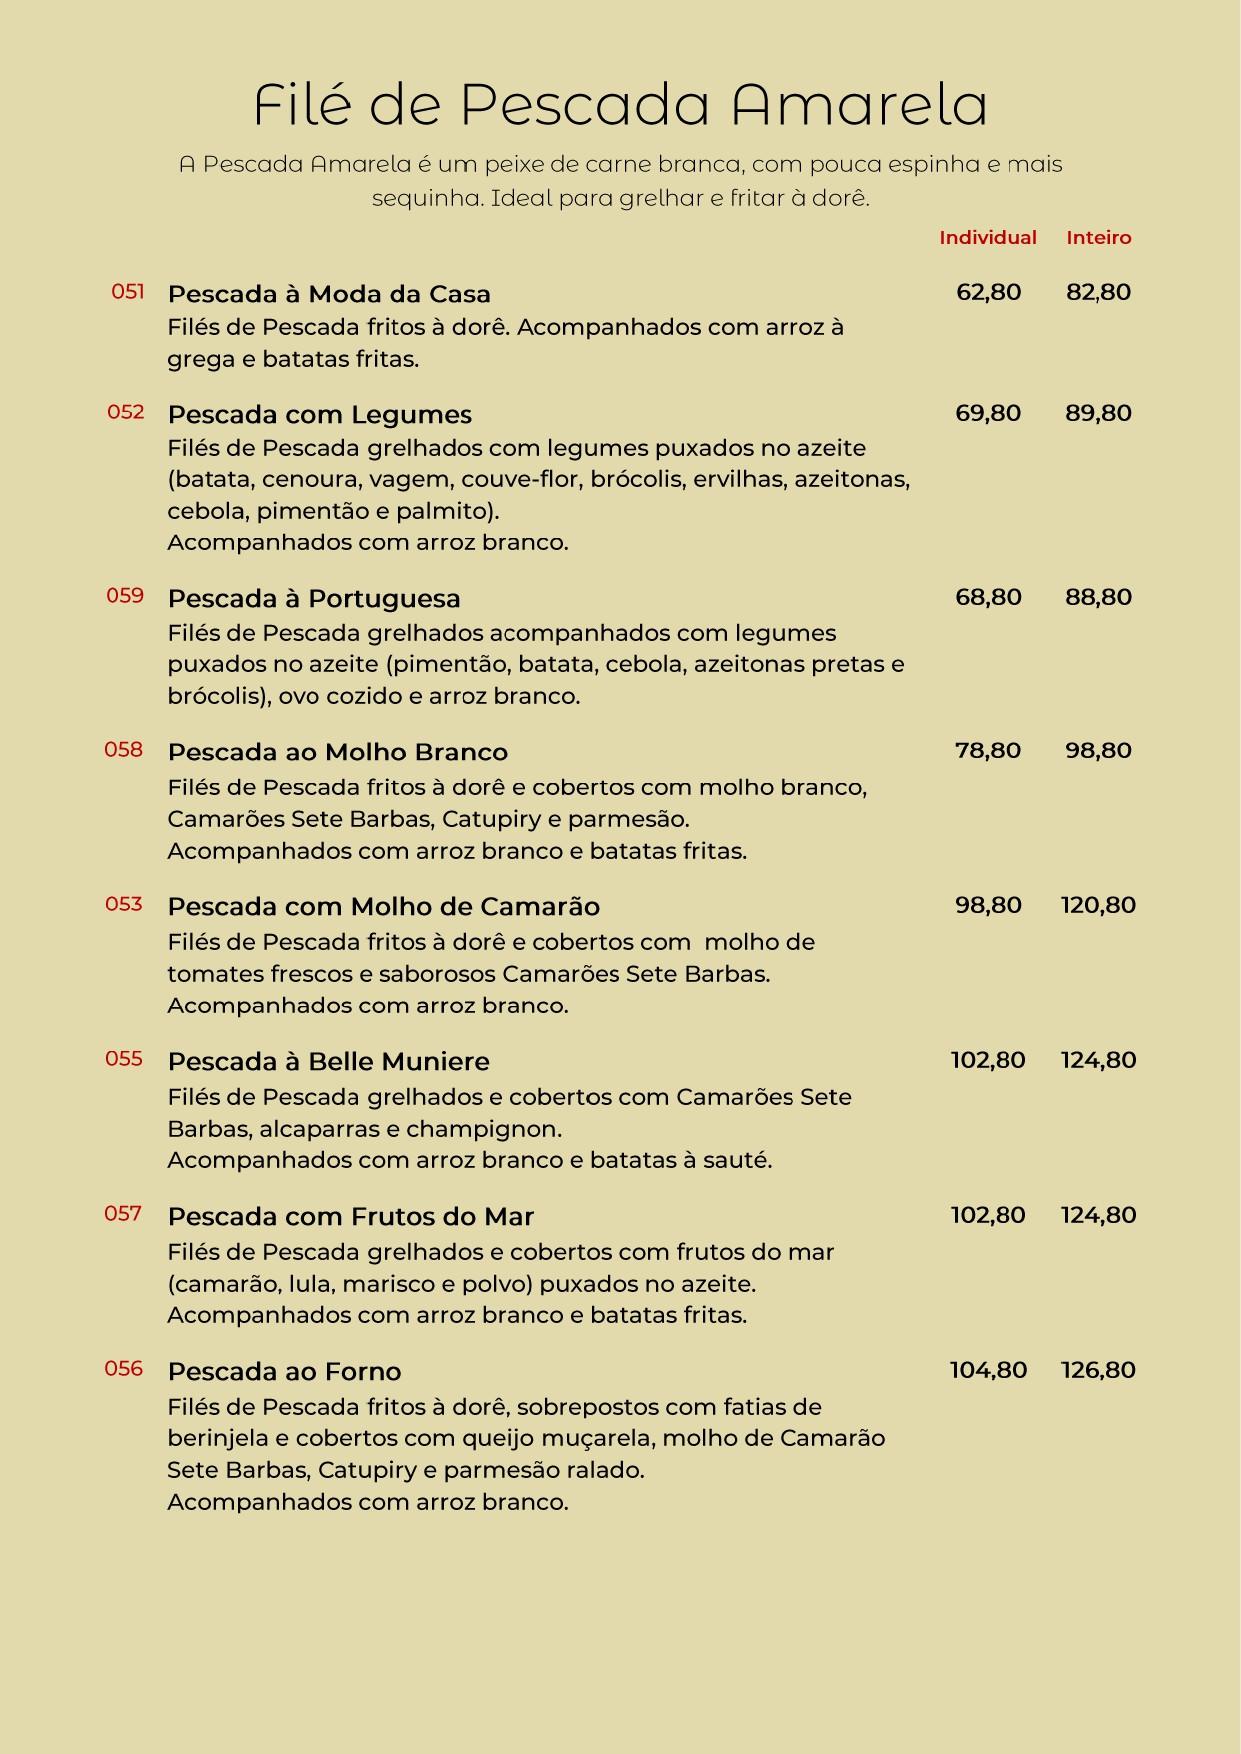 Cardápio Digital_page-0007.jpg